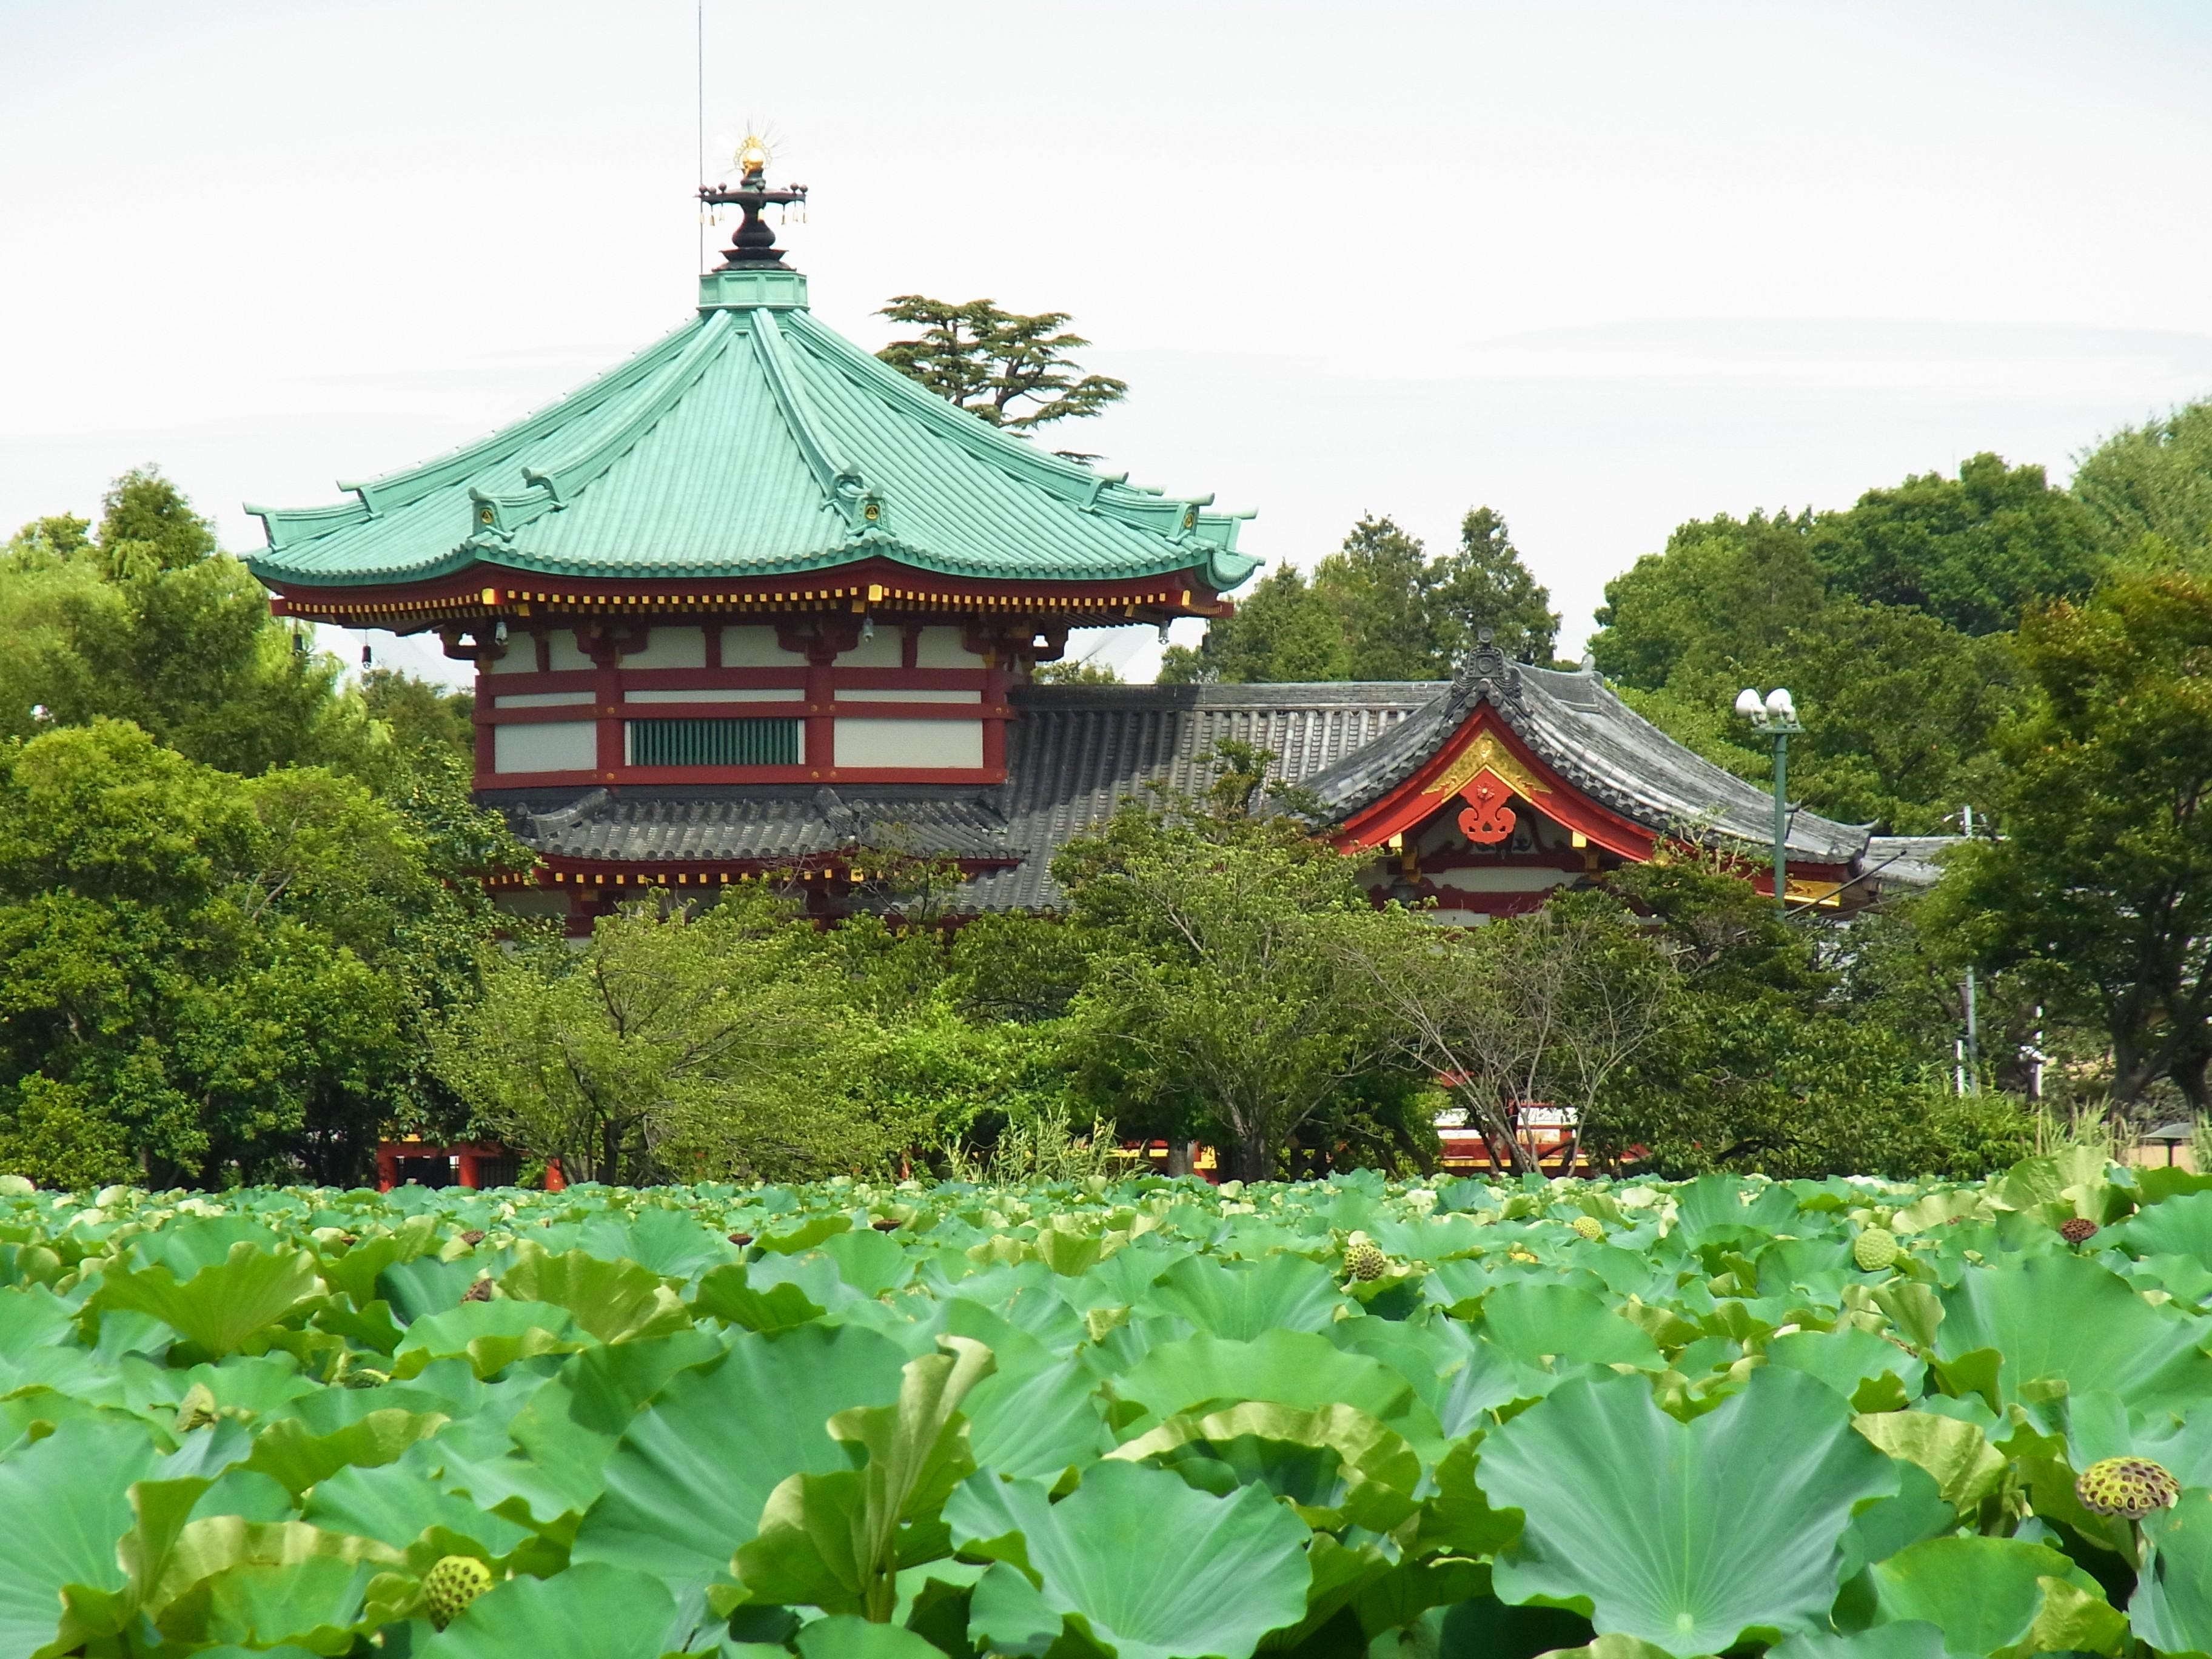 Tokyo in due giorni: Ueno Park Shinobazu Pond